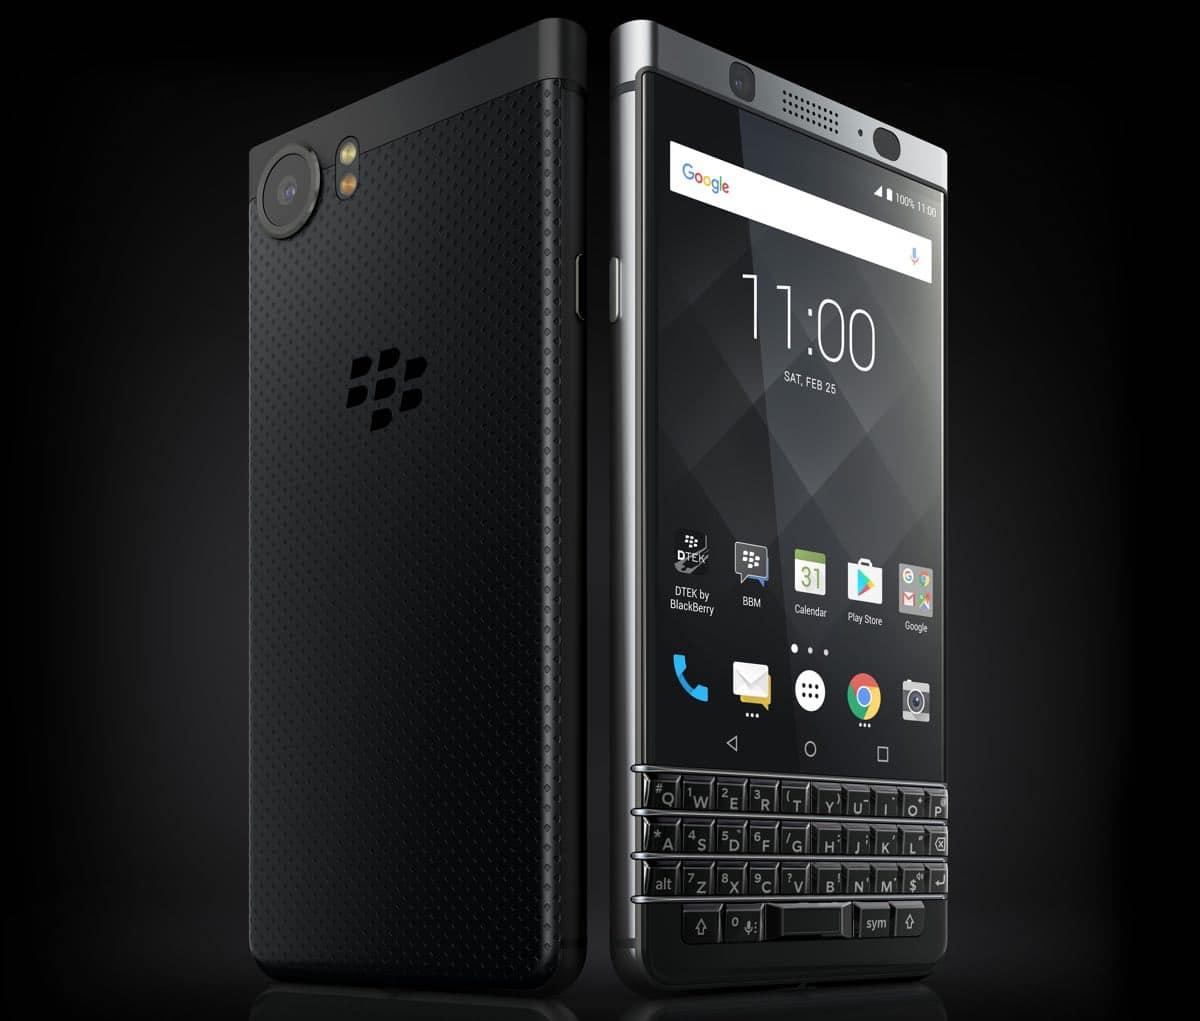 blackberry keyone black edition photo